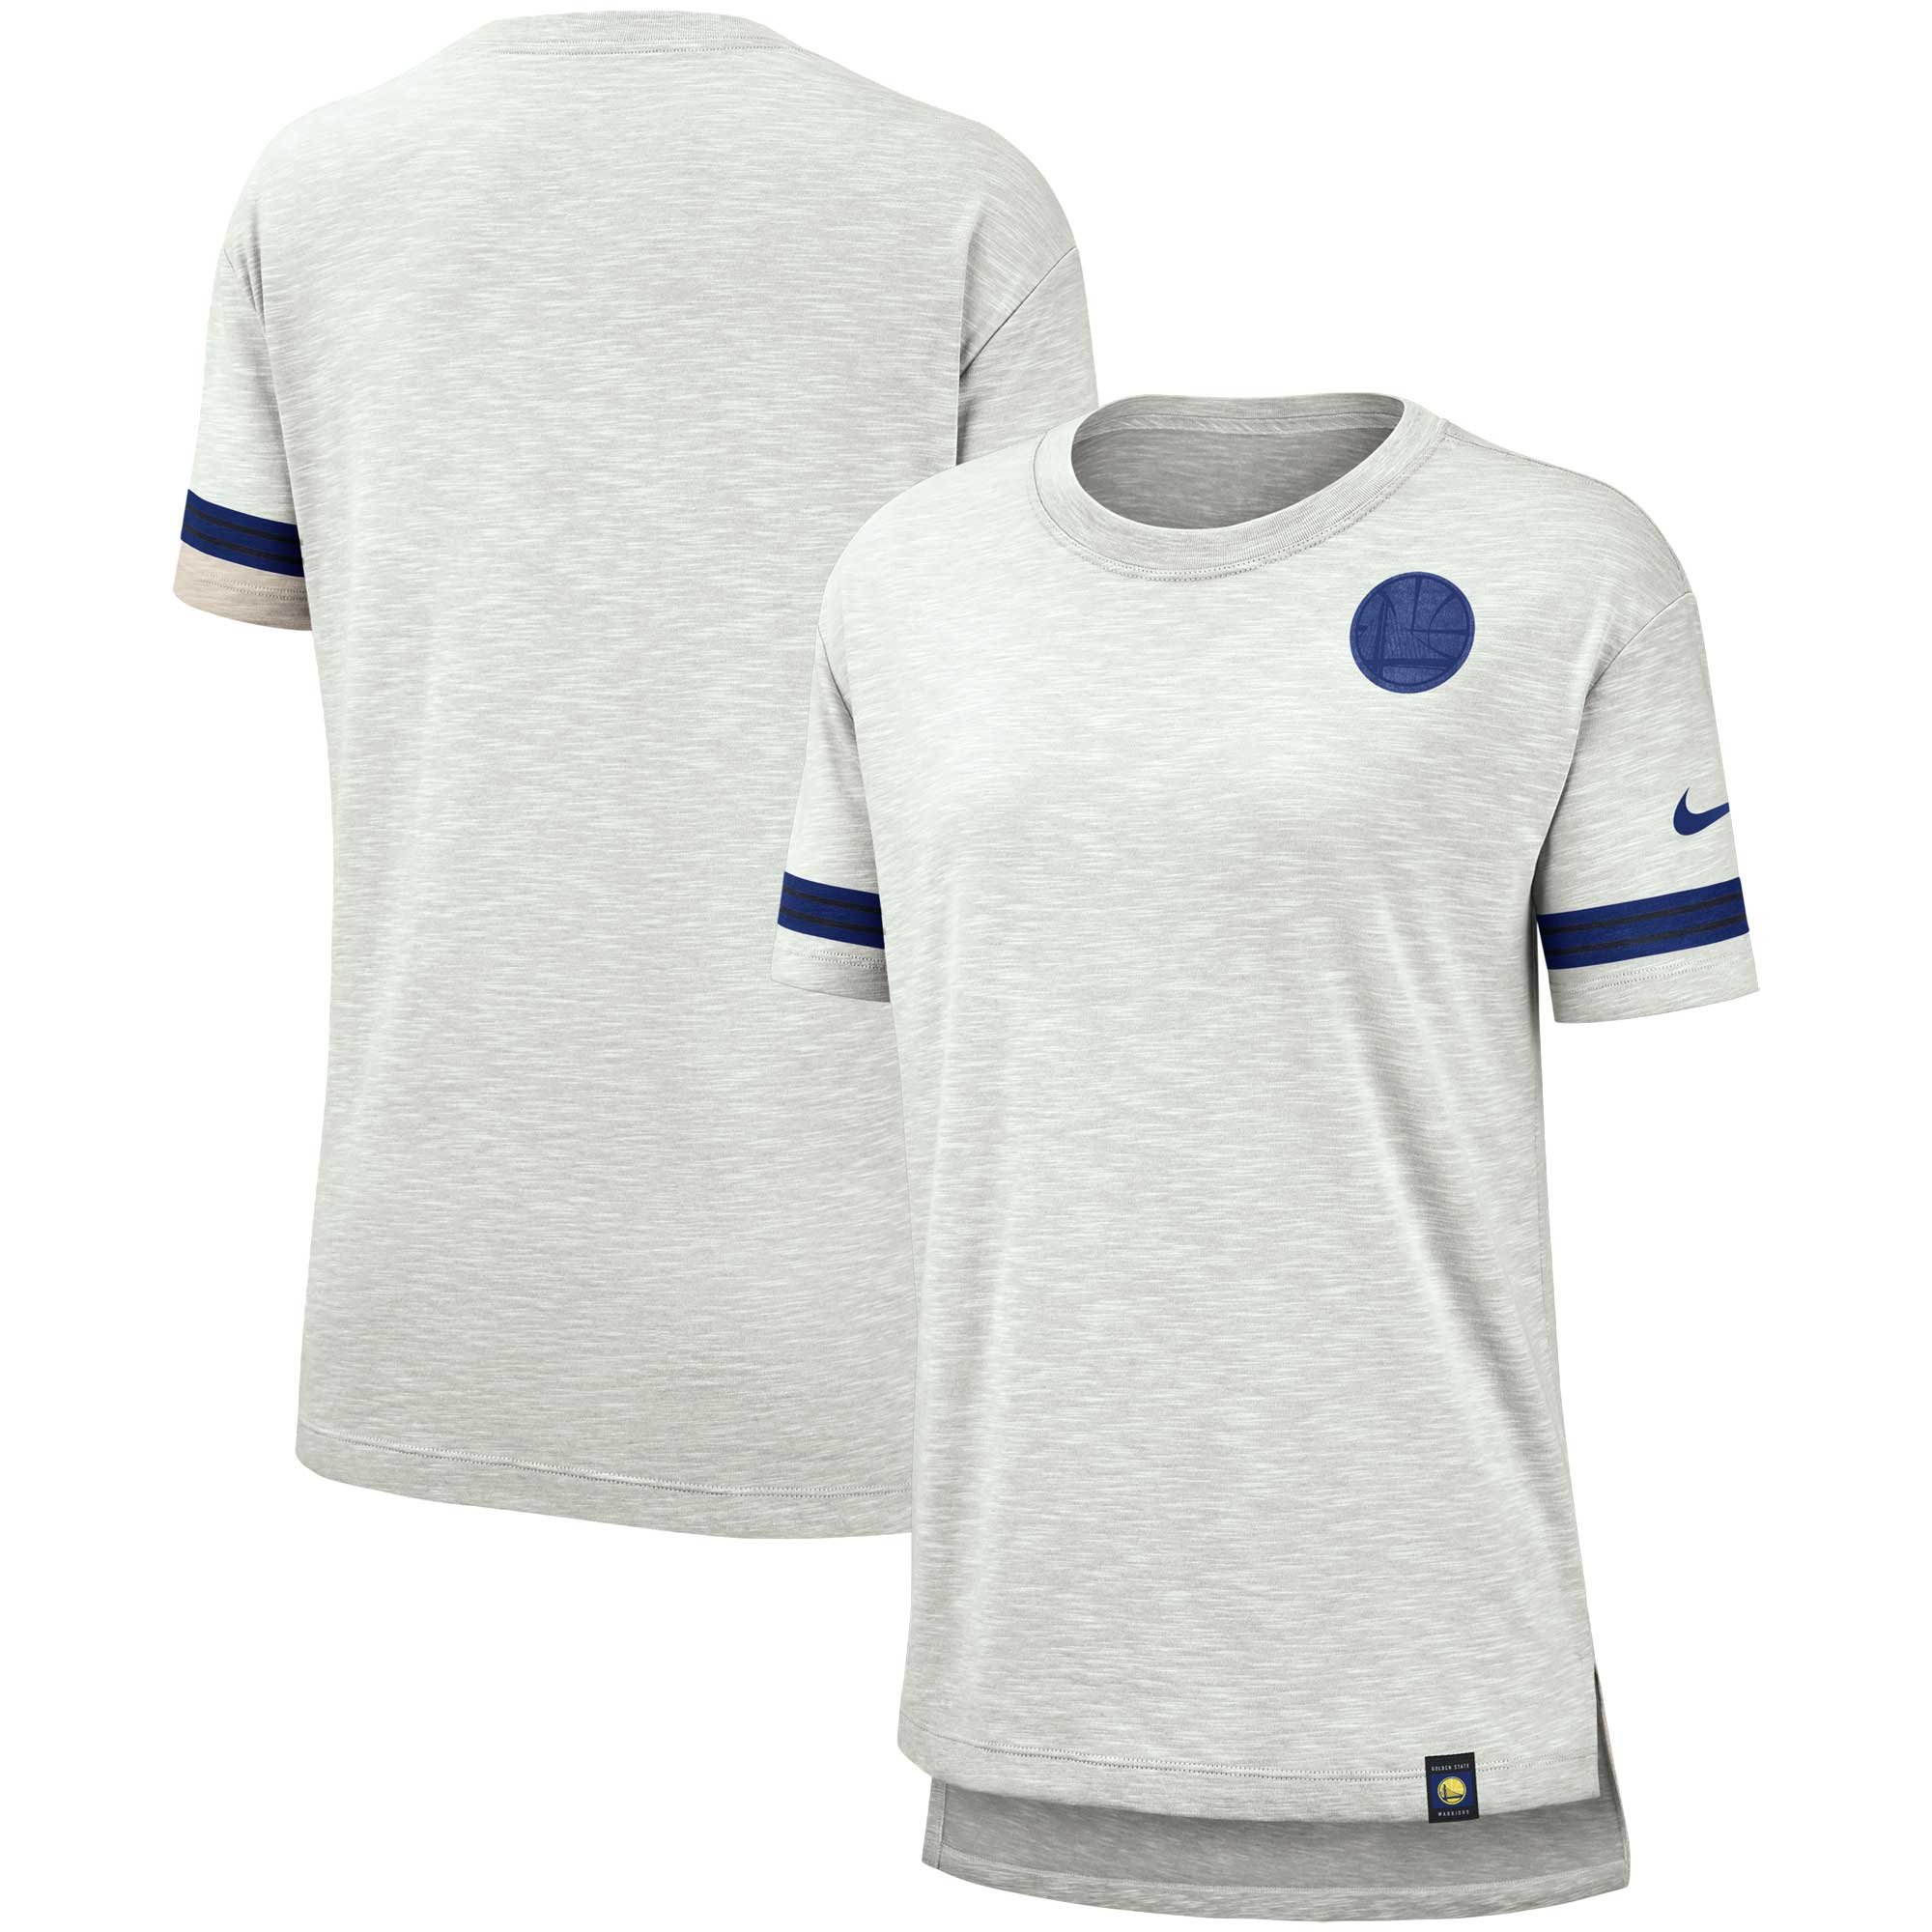 Golden State Warriors Nike Women's Color Rush Sleeve Stripe Slub T-Shirt - Heathered Gray